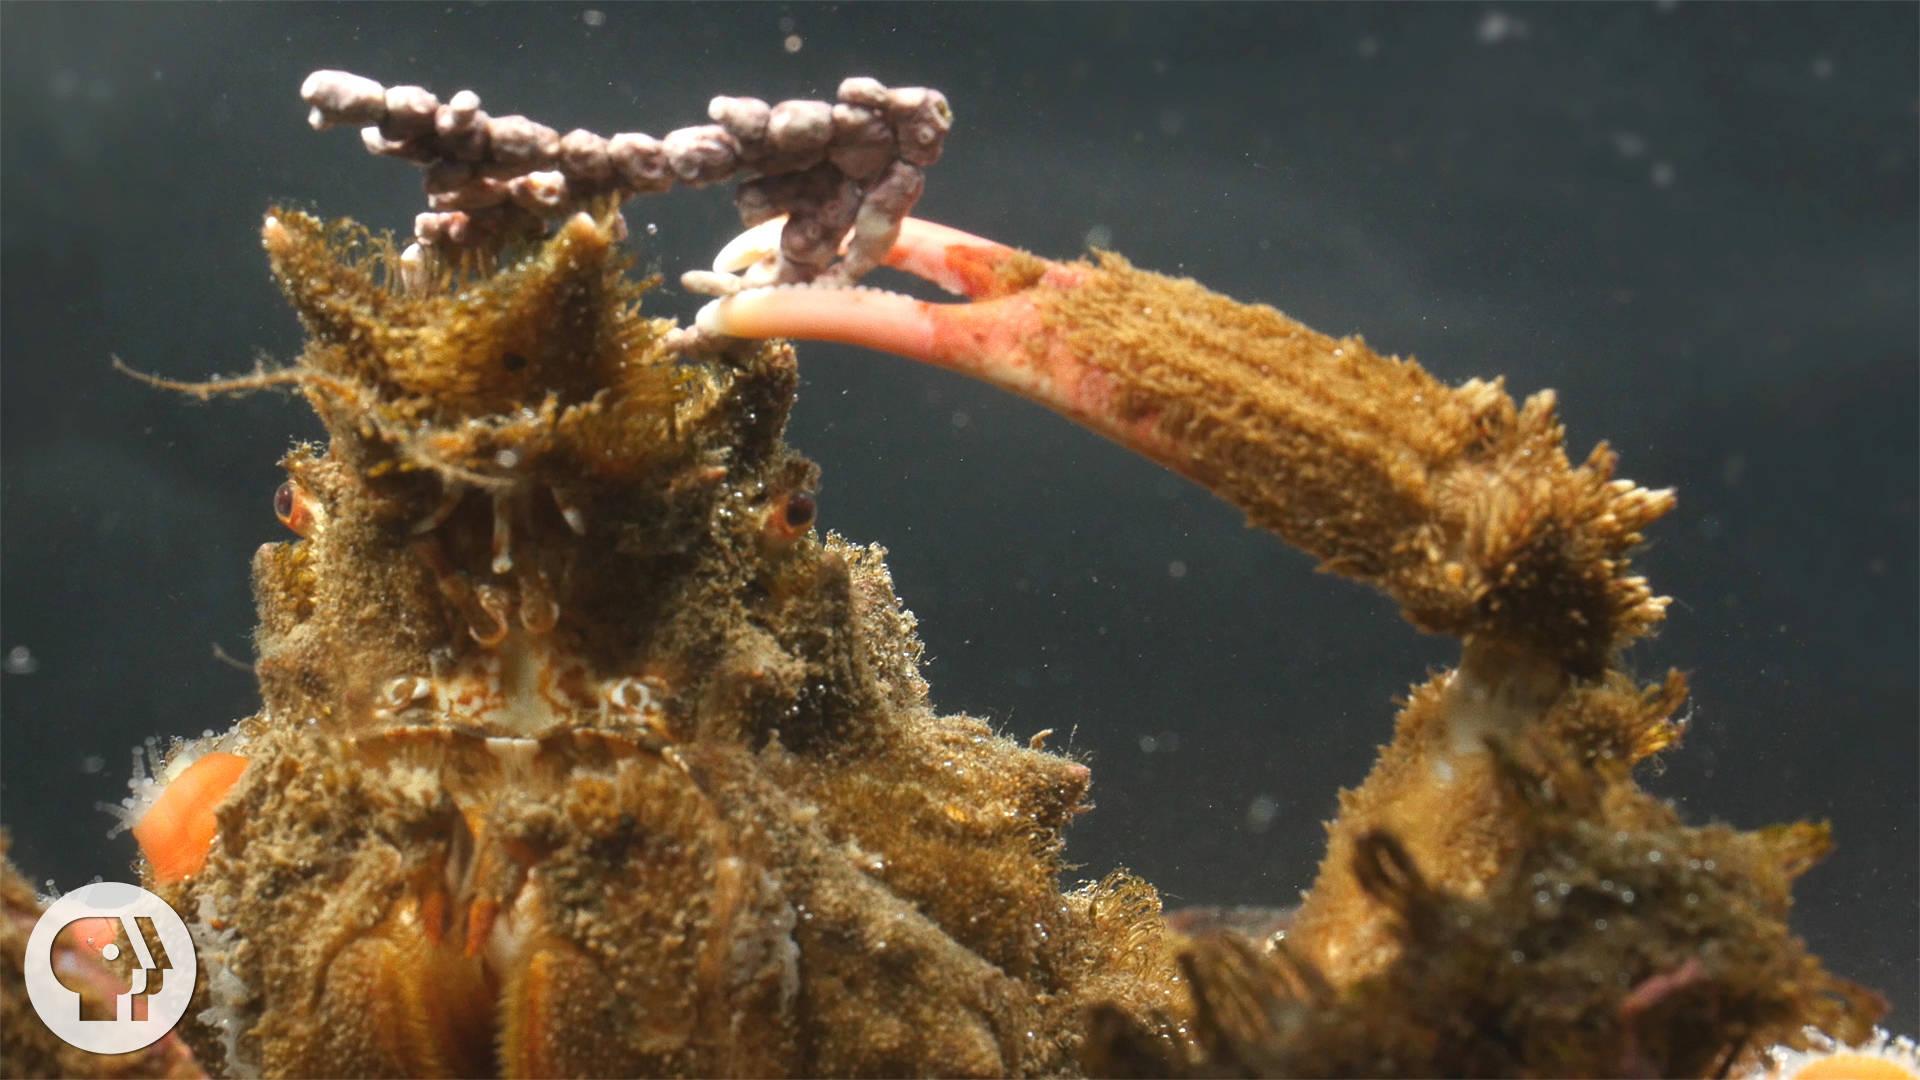 in crab camouflage at cruz decor decorator naturetime marine discovery with poms photo seymour pom center santa